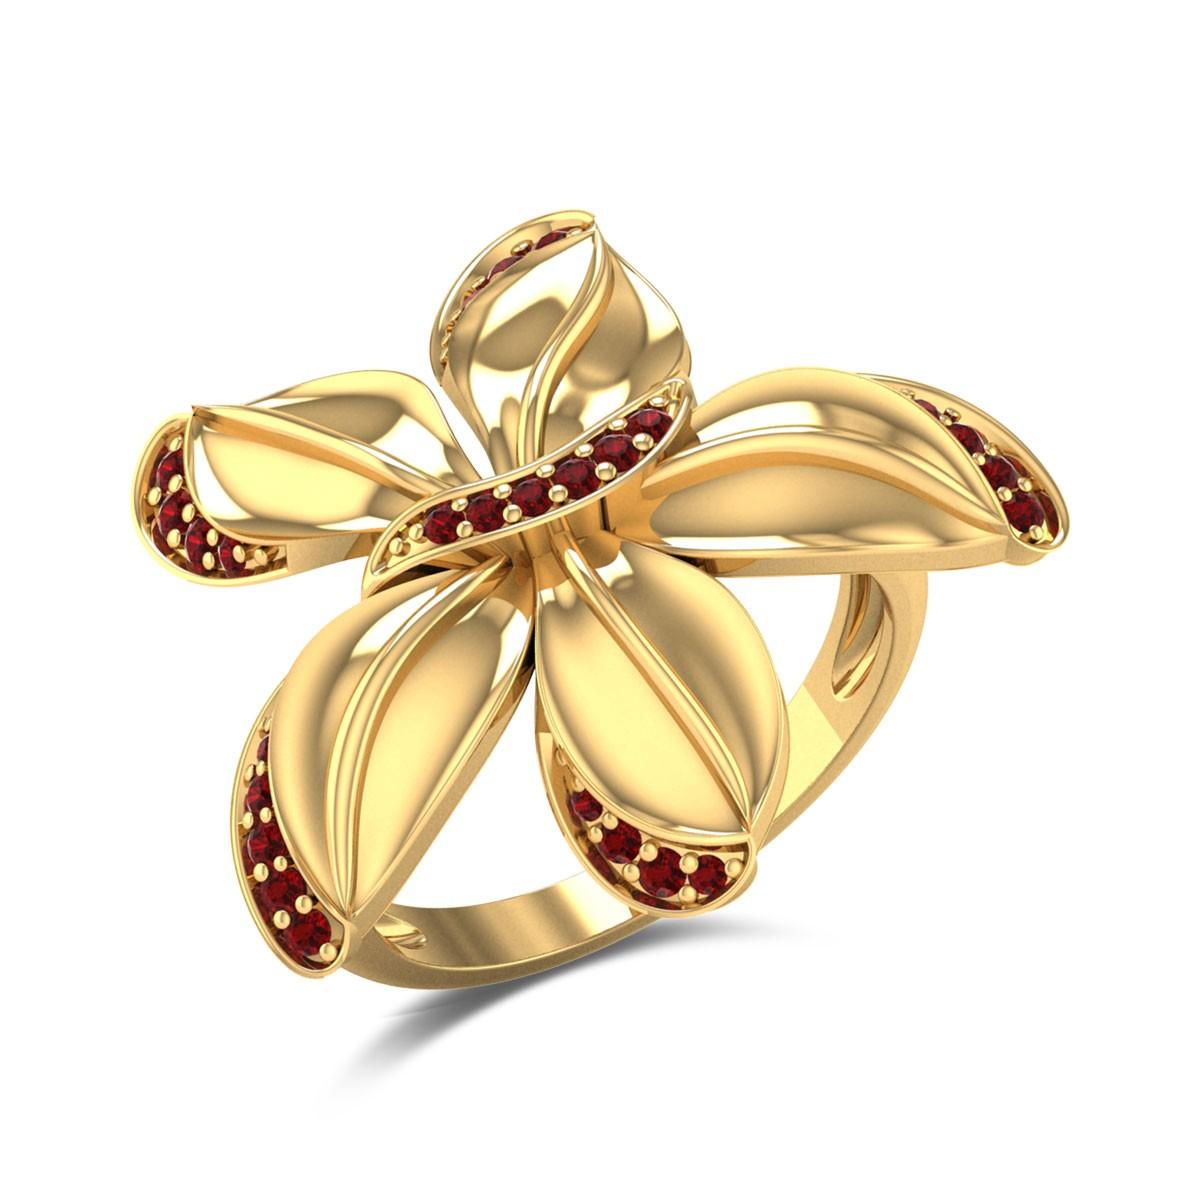 Lara Gemstone Ring